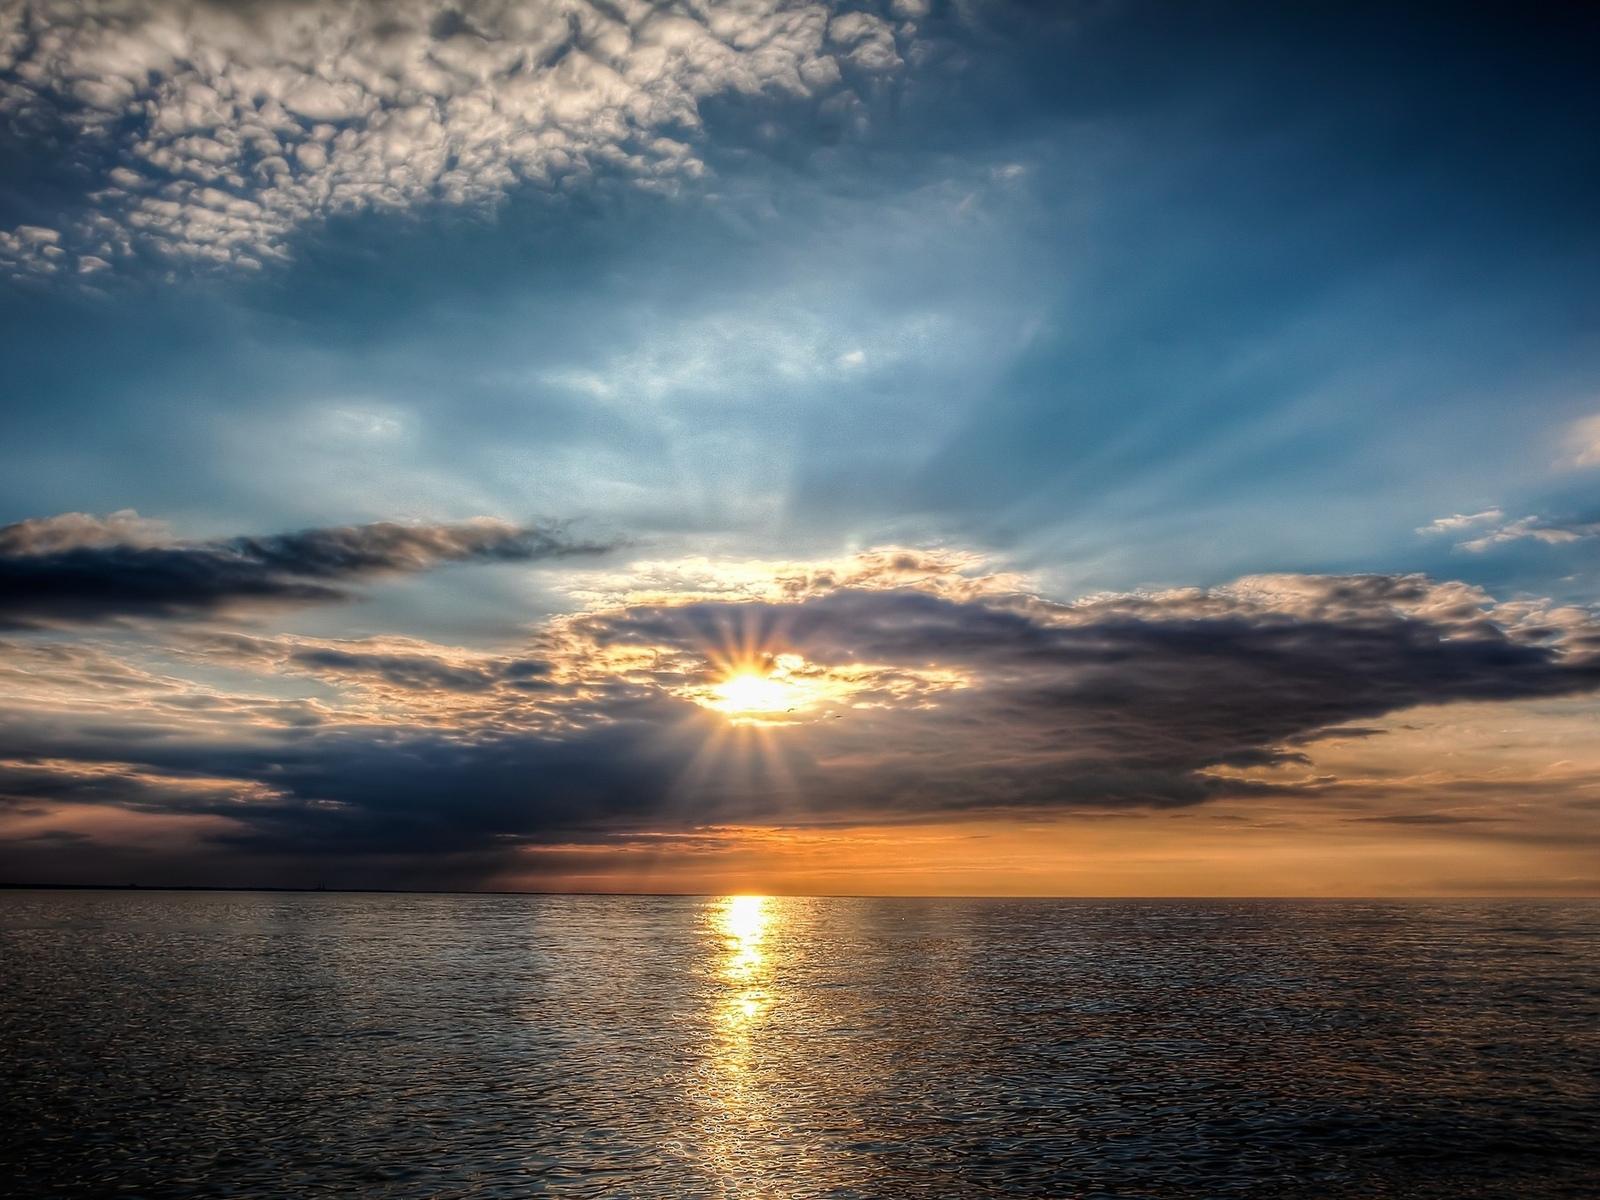 океан, солнце